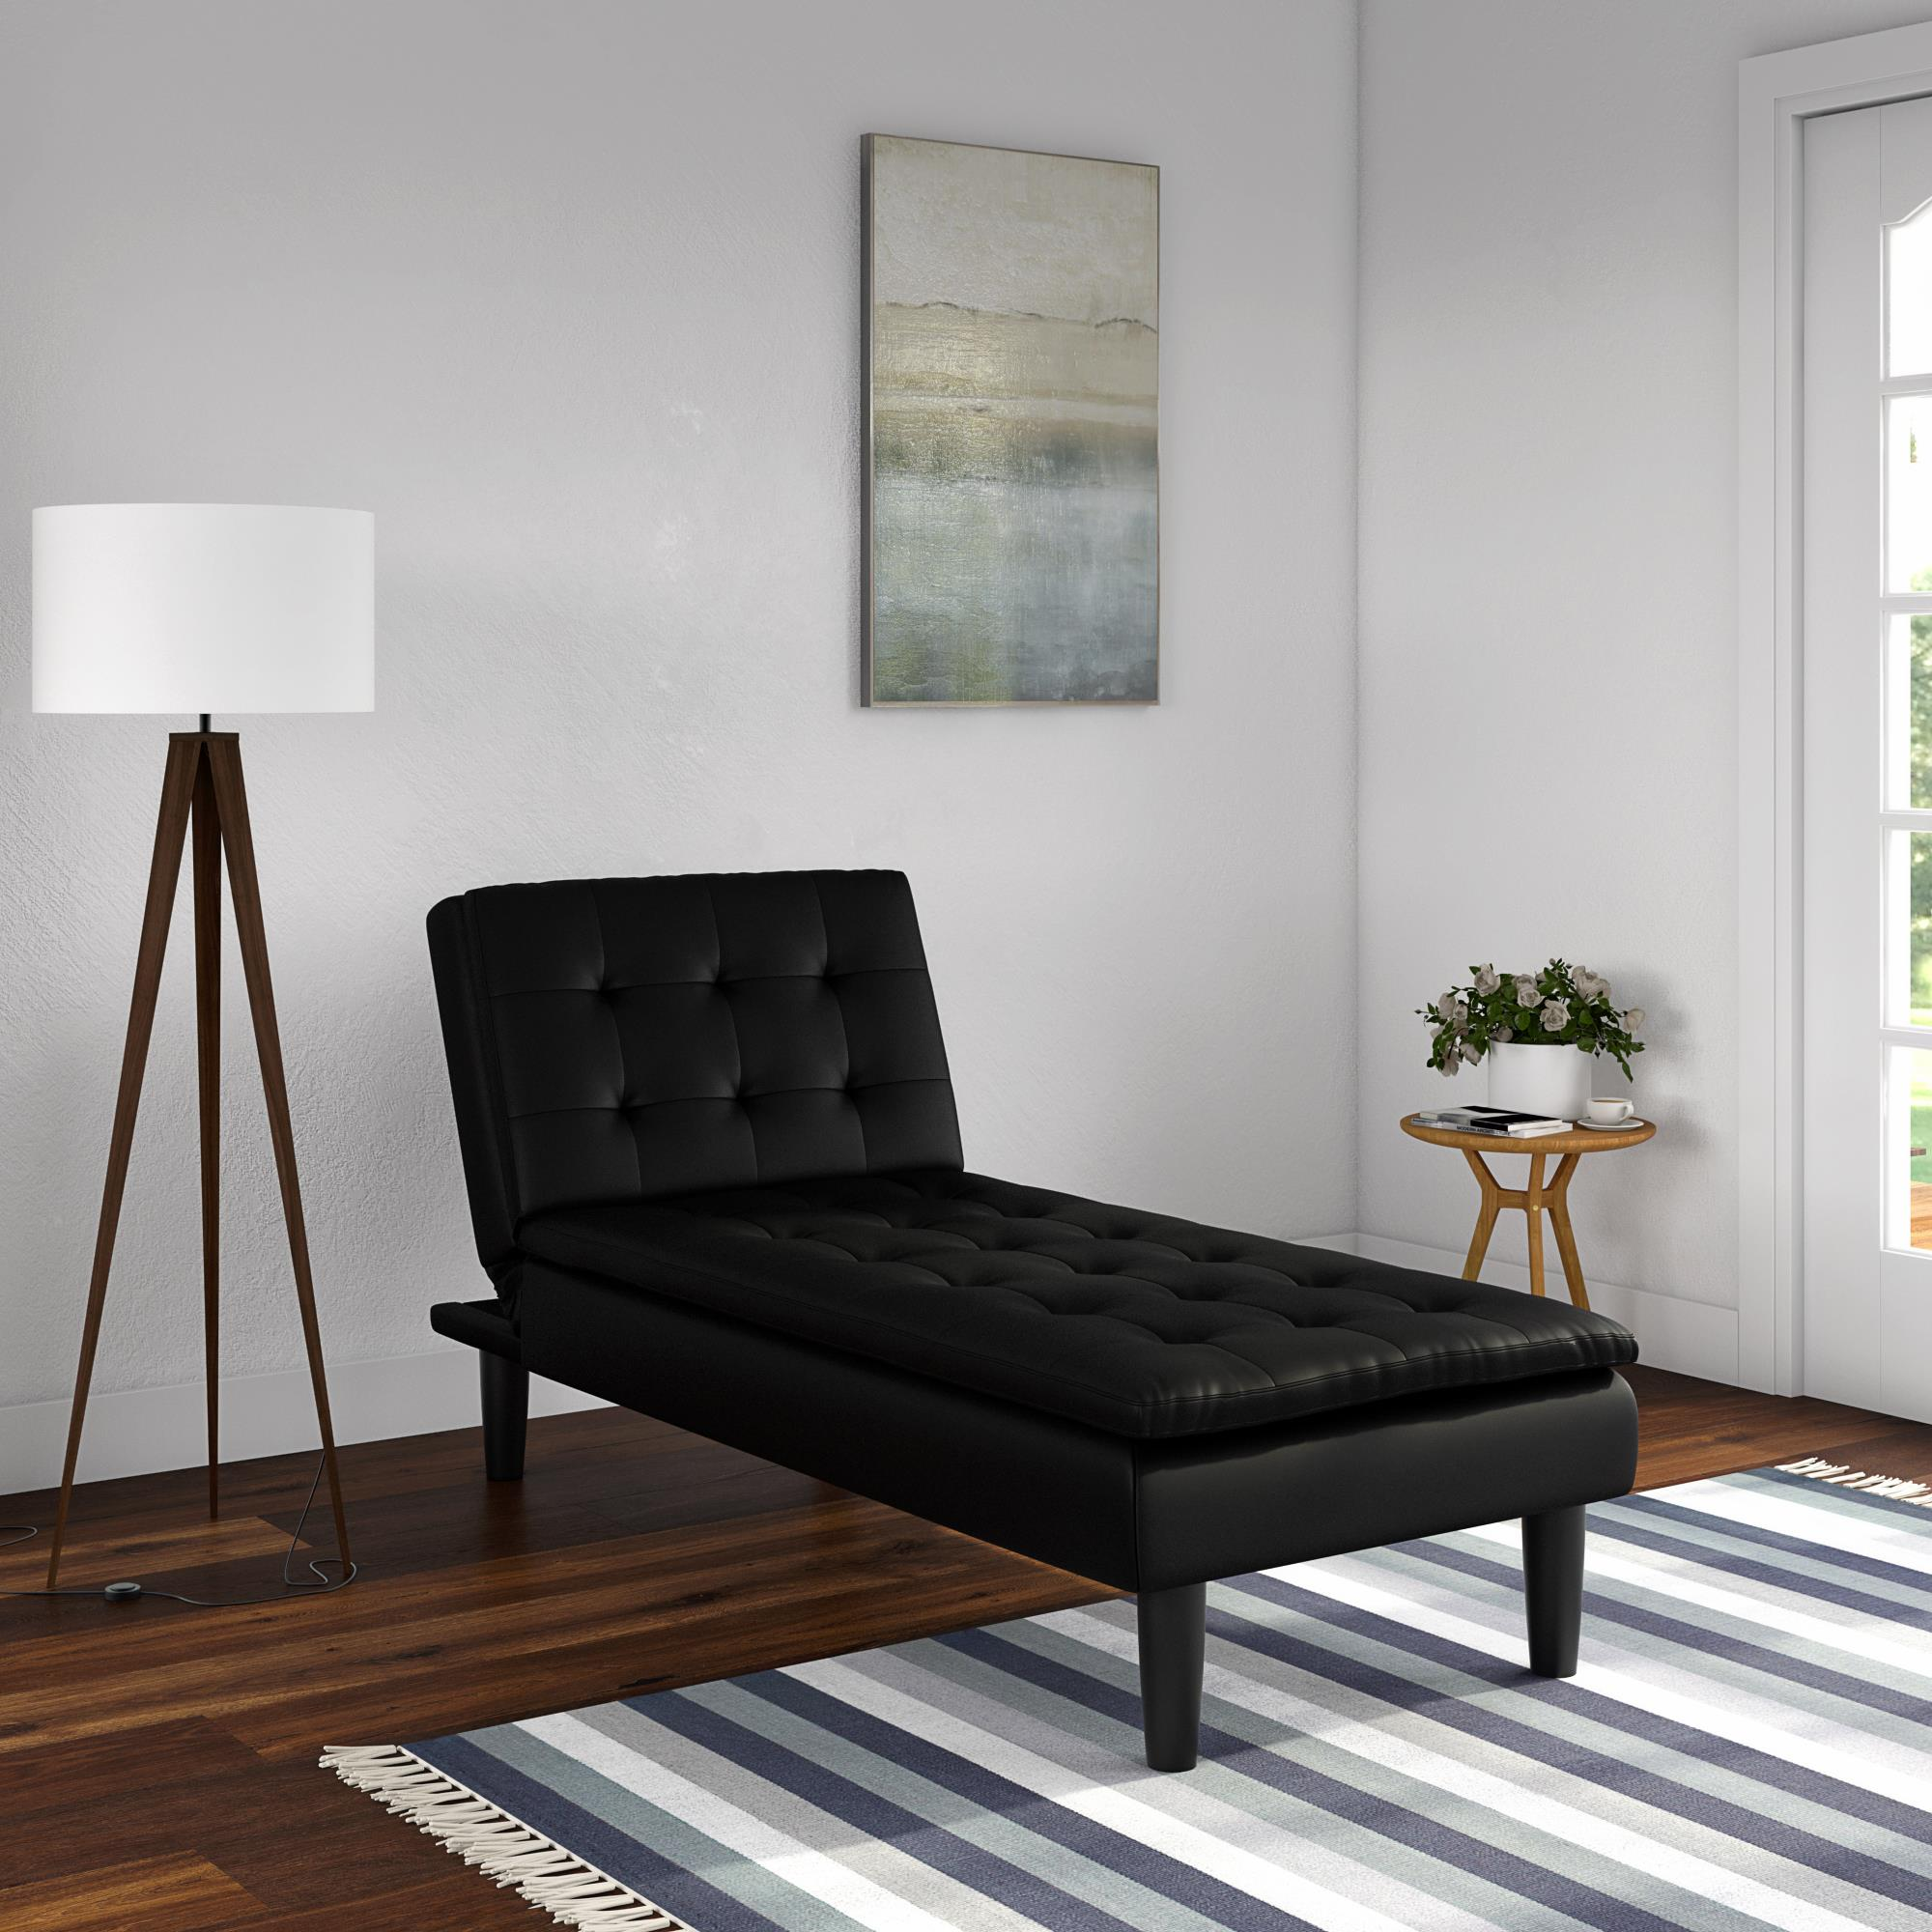 Mainstays Memory Foam Pillow Top Chaise Lounger Dark Brown Faux Leather Walmart Com Walmart Com